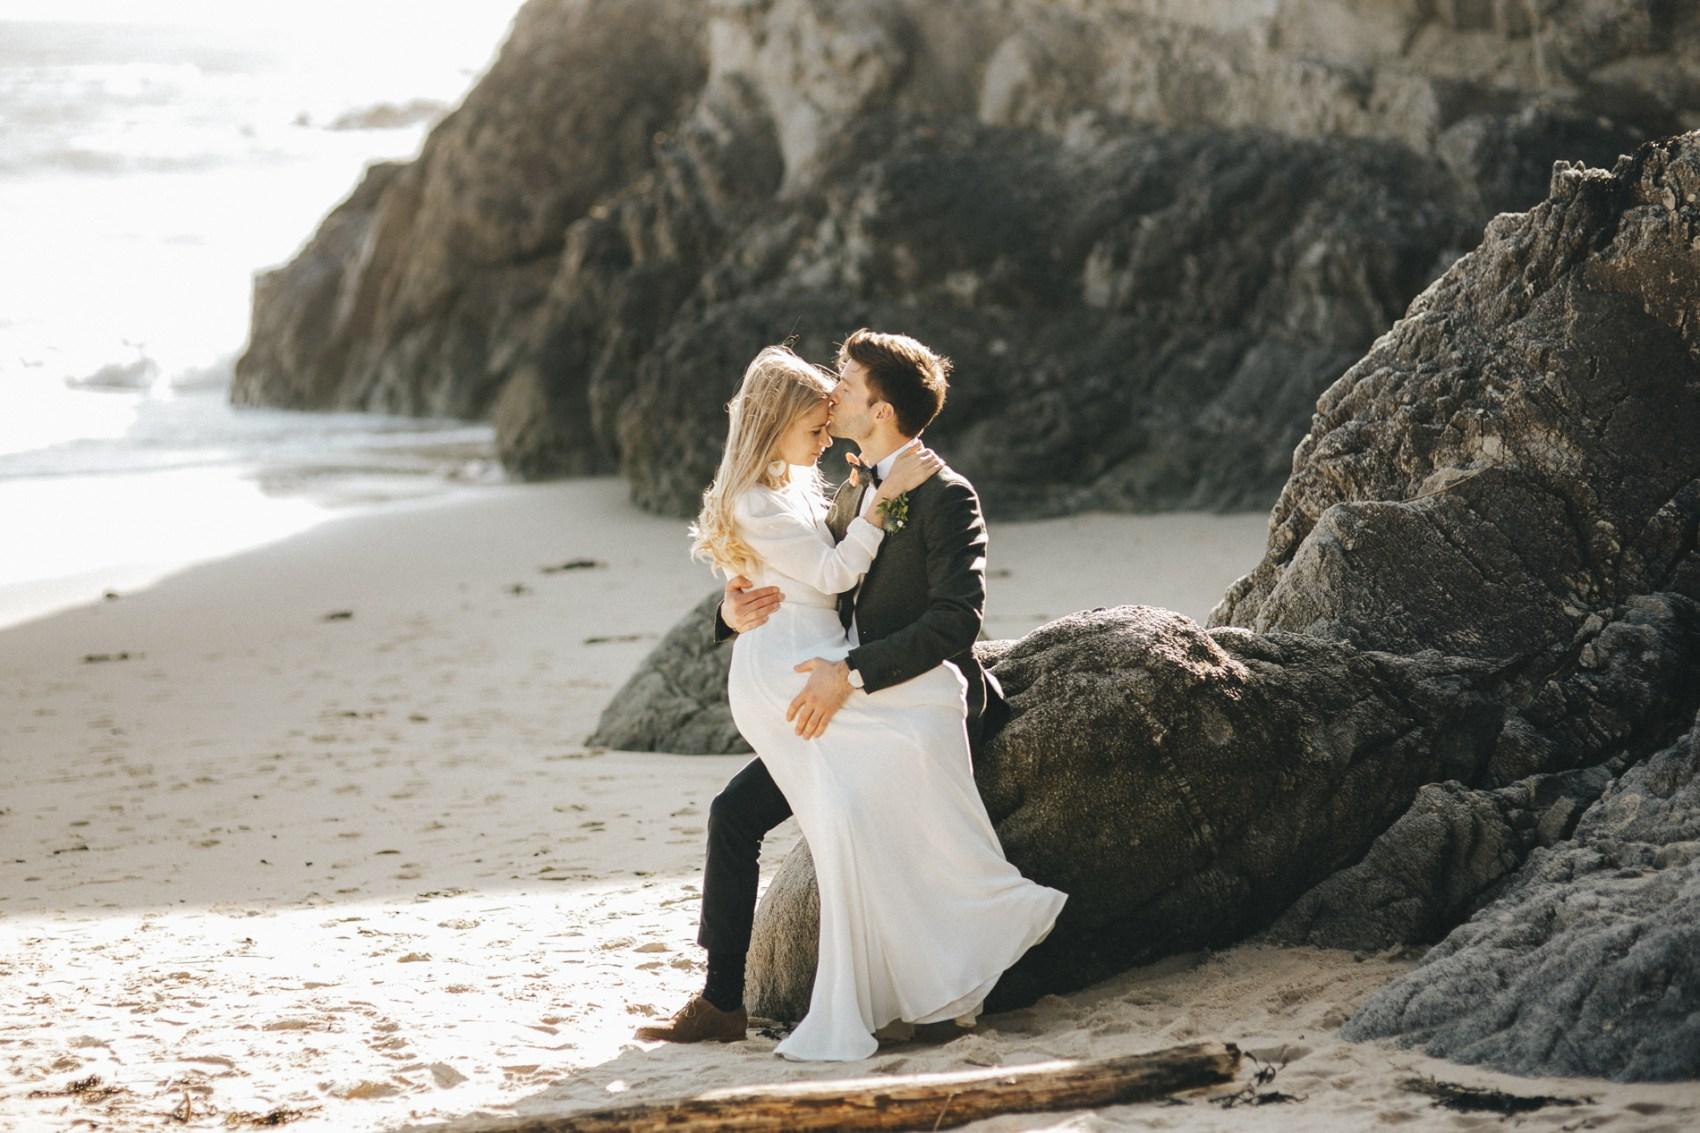 intimate-wedding-la-baule-pouliguen-mariage-117.jpg